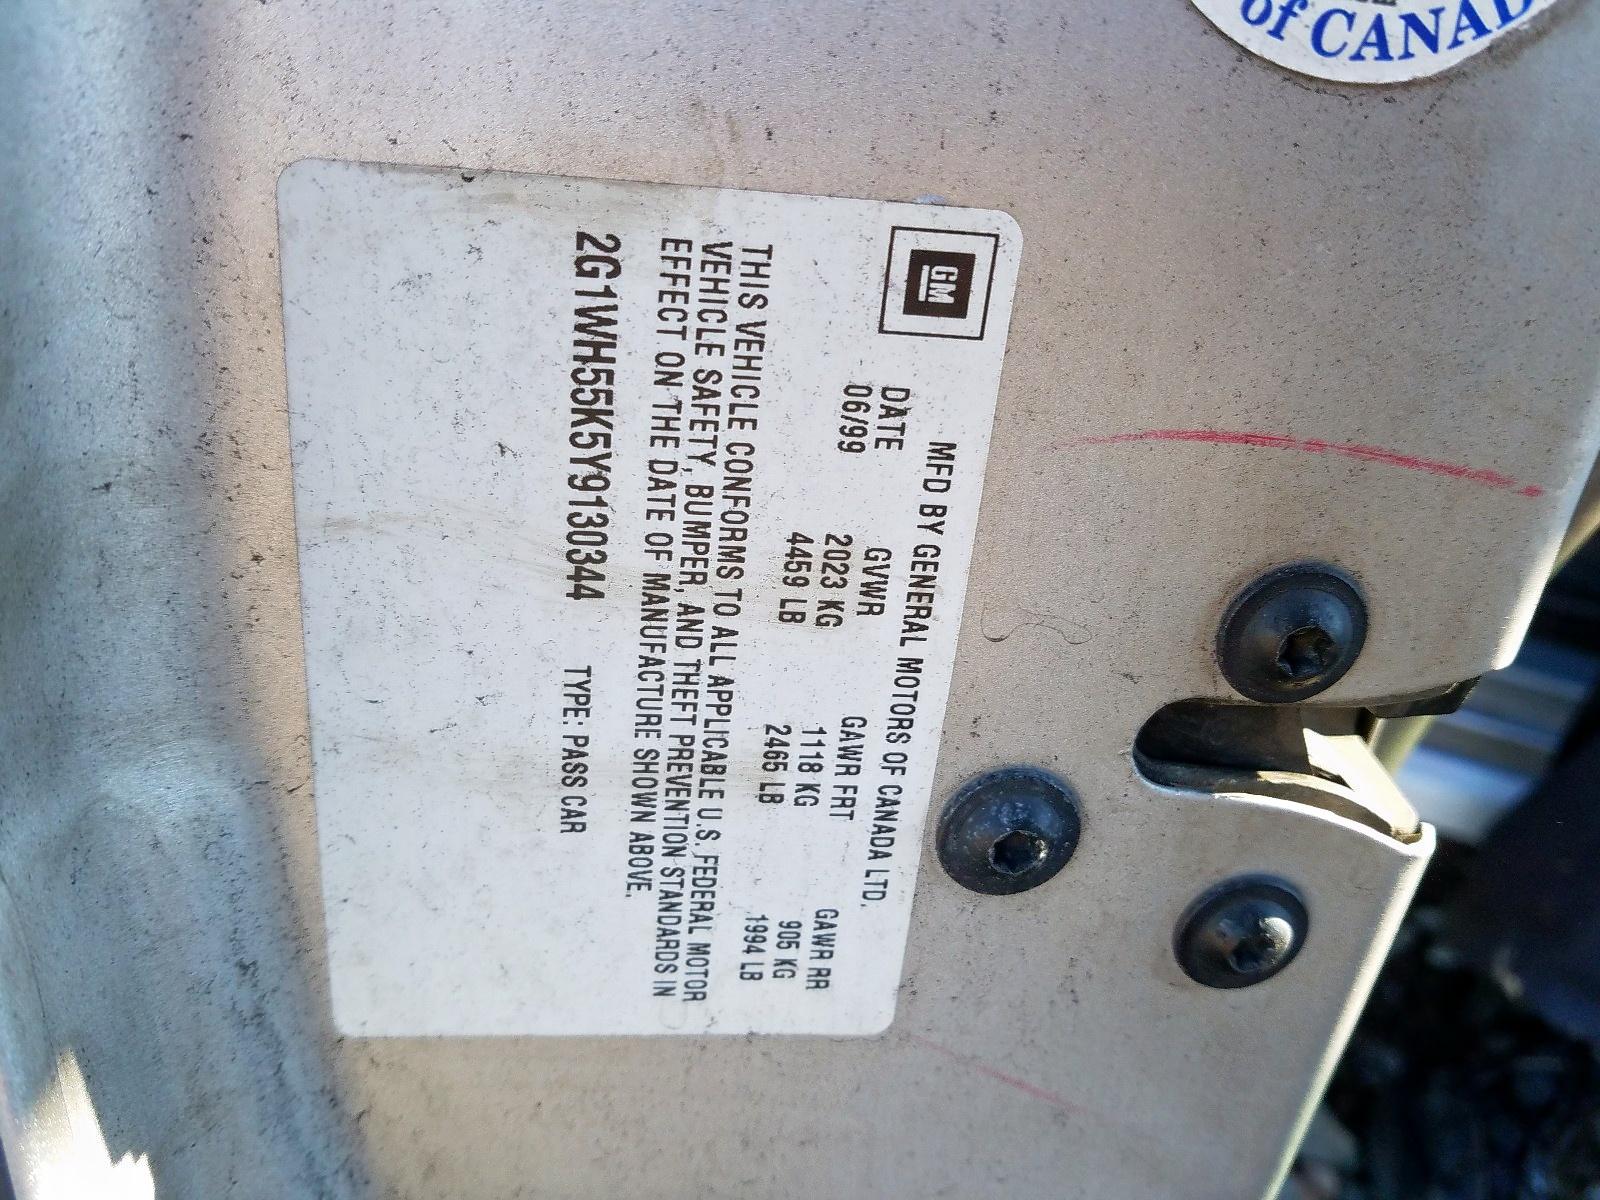 2G1WH55K5Y9130344 - 2000 Chevrolet Impala Ls 3.8L